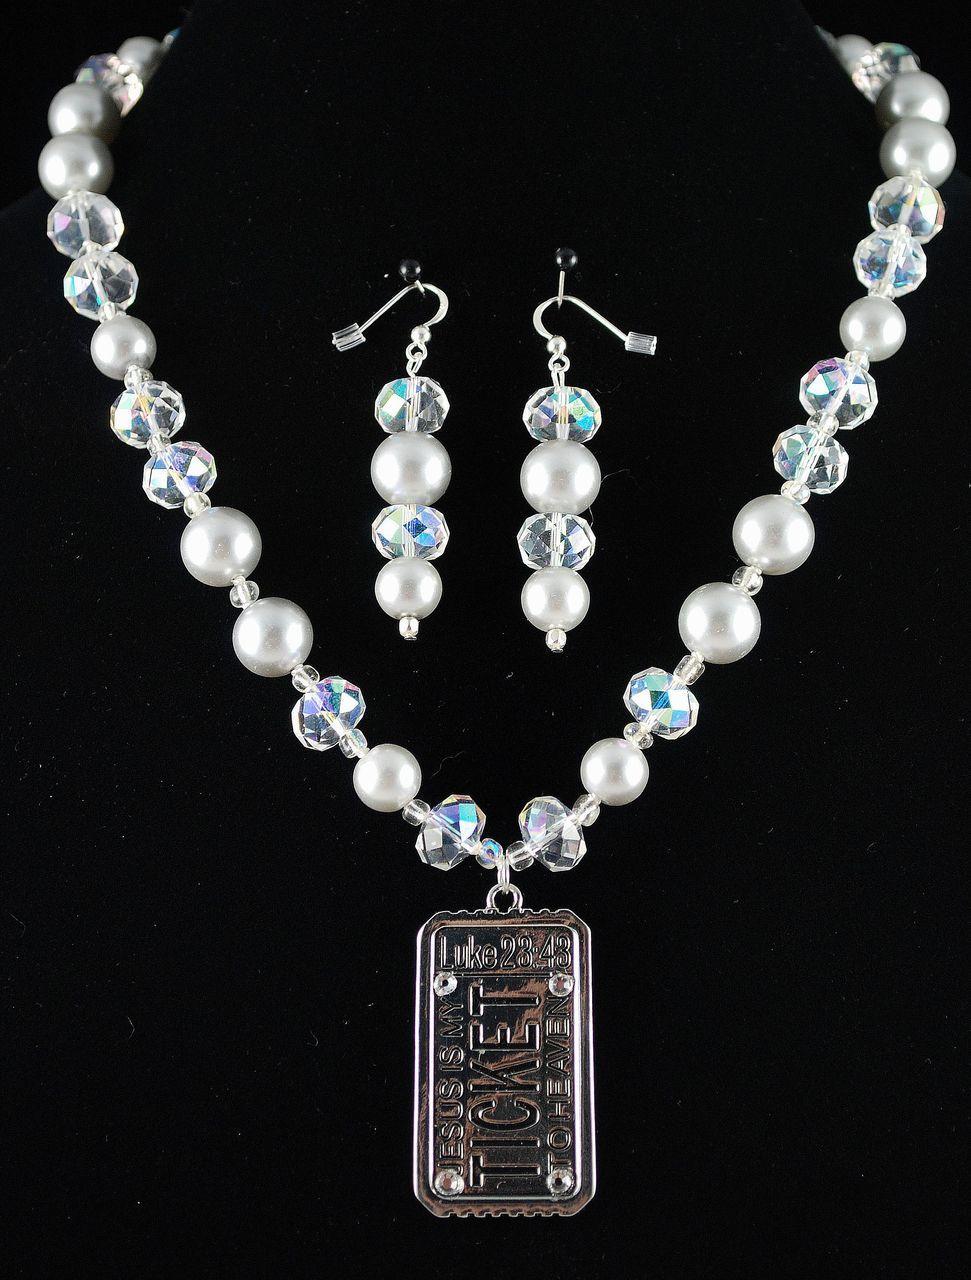 Enchanting Jewelry Creations image 6